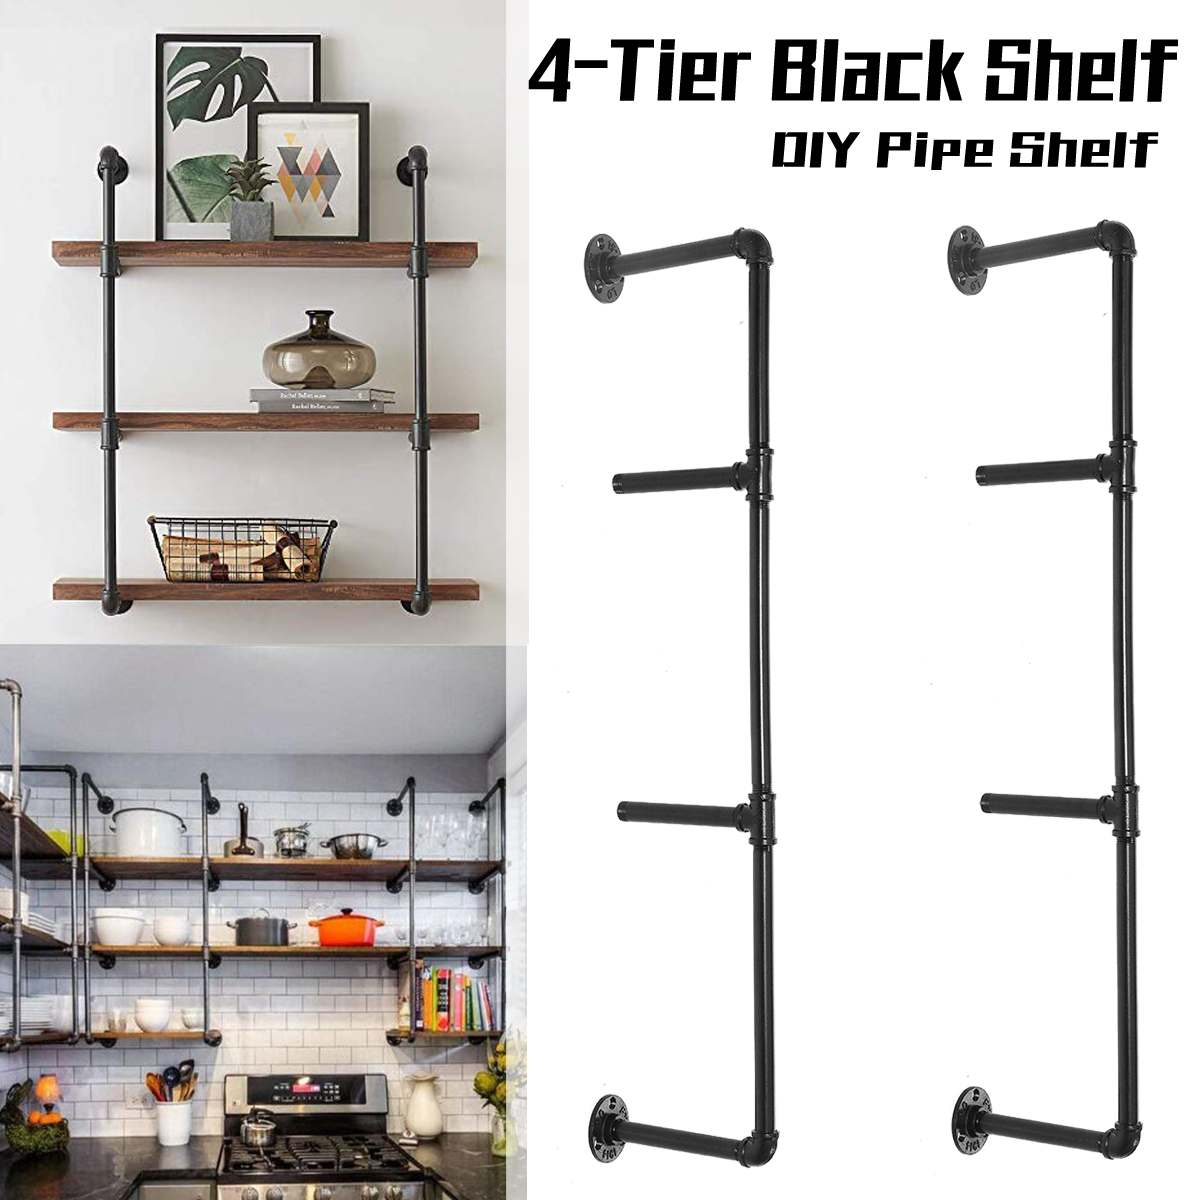 Us 59 01 43 Off 2 Pcs 4 Tier Shelf Industrial Furniture Wall Shelf Bracket Hanging Storage Shelves Iron Pipe Black Diy Pipe Shelves In Brackets From